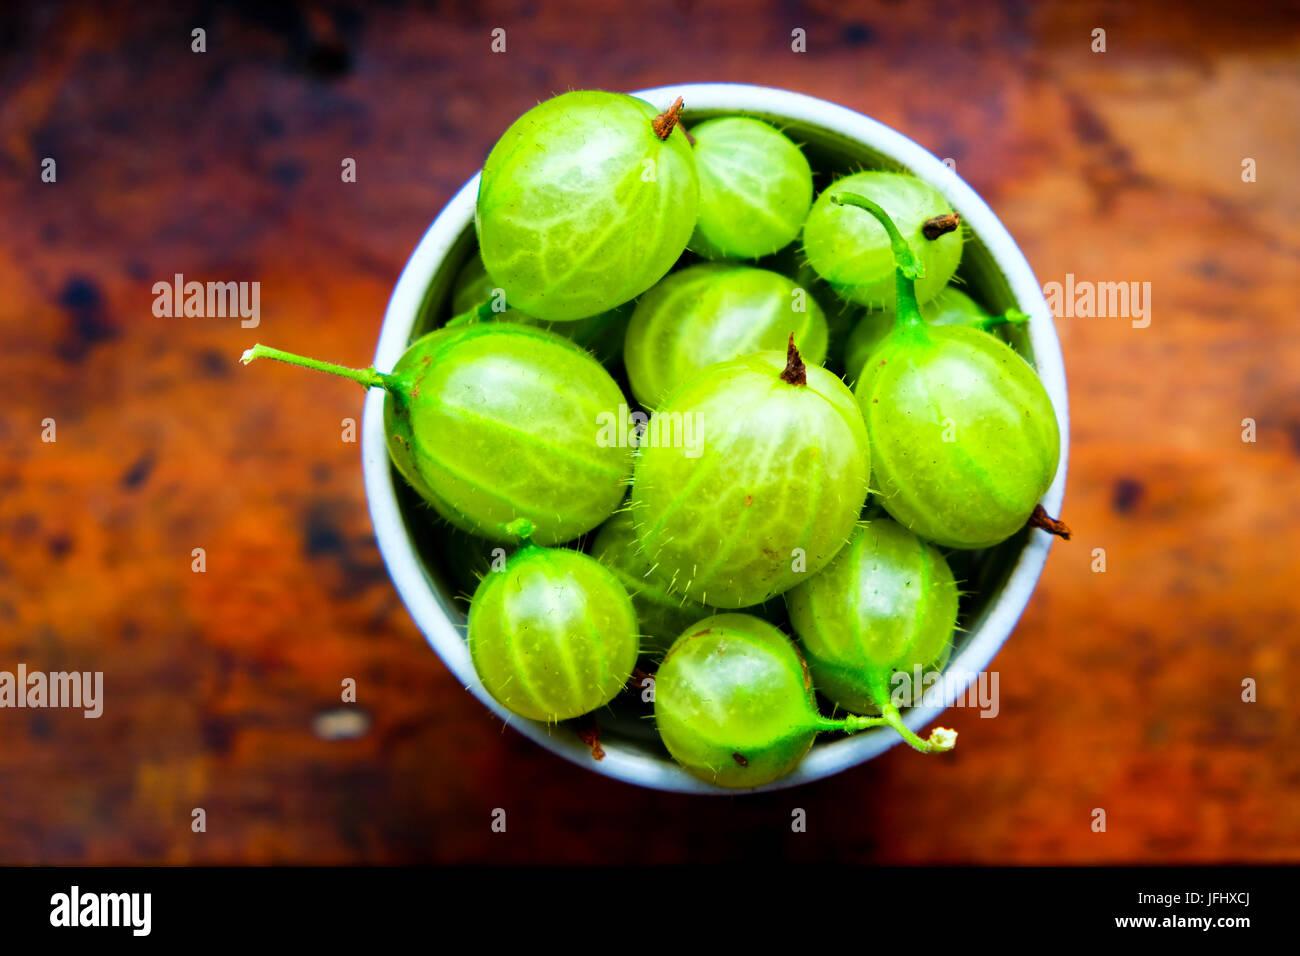 small bowl of Gooseberries in grey pottery bowl, the bowl is full of gooseberries, there are 5 green gooseberries Stock Photo